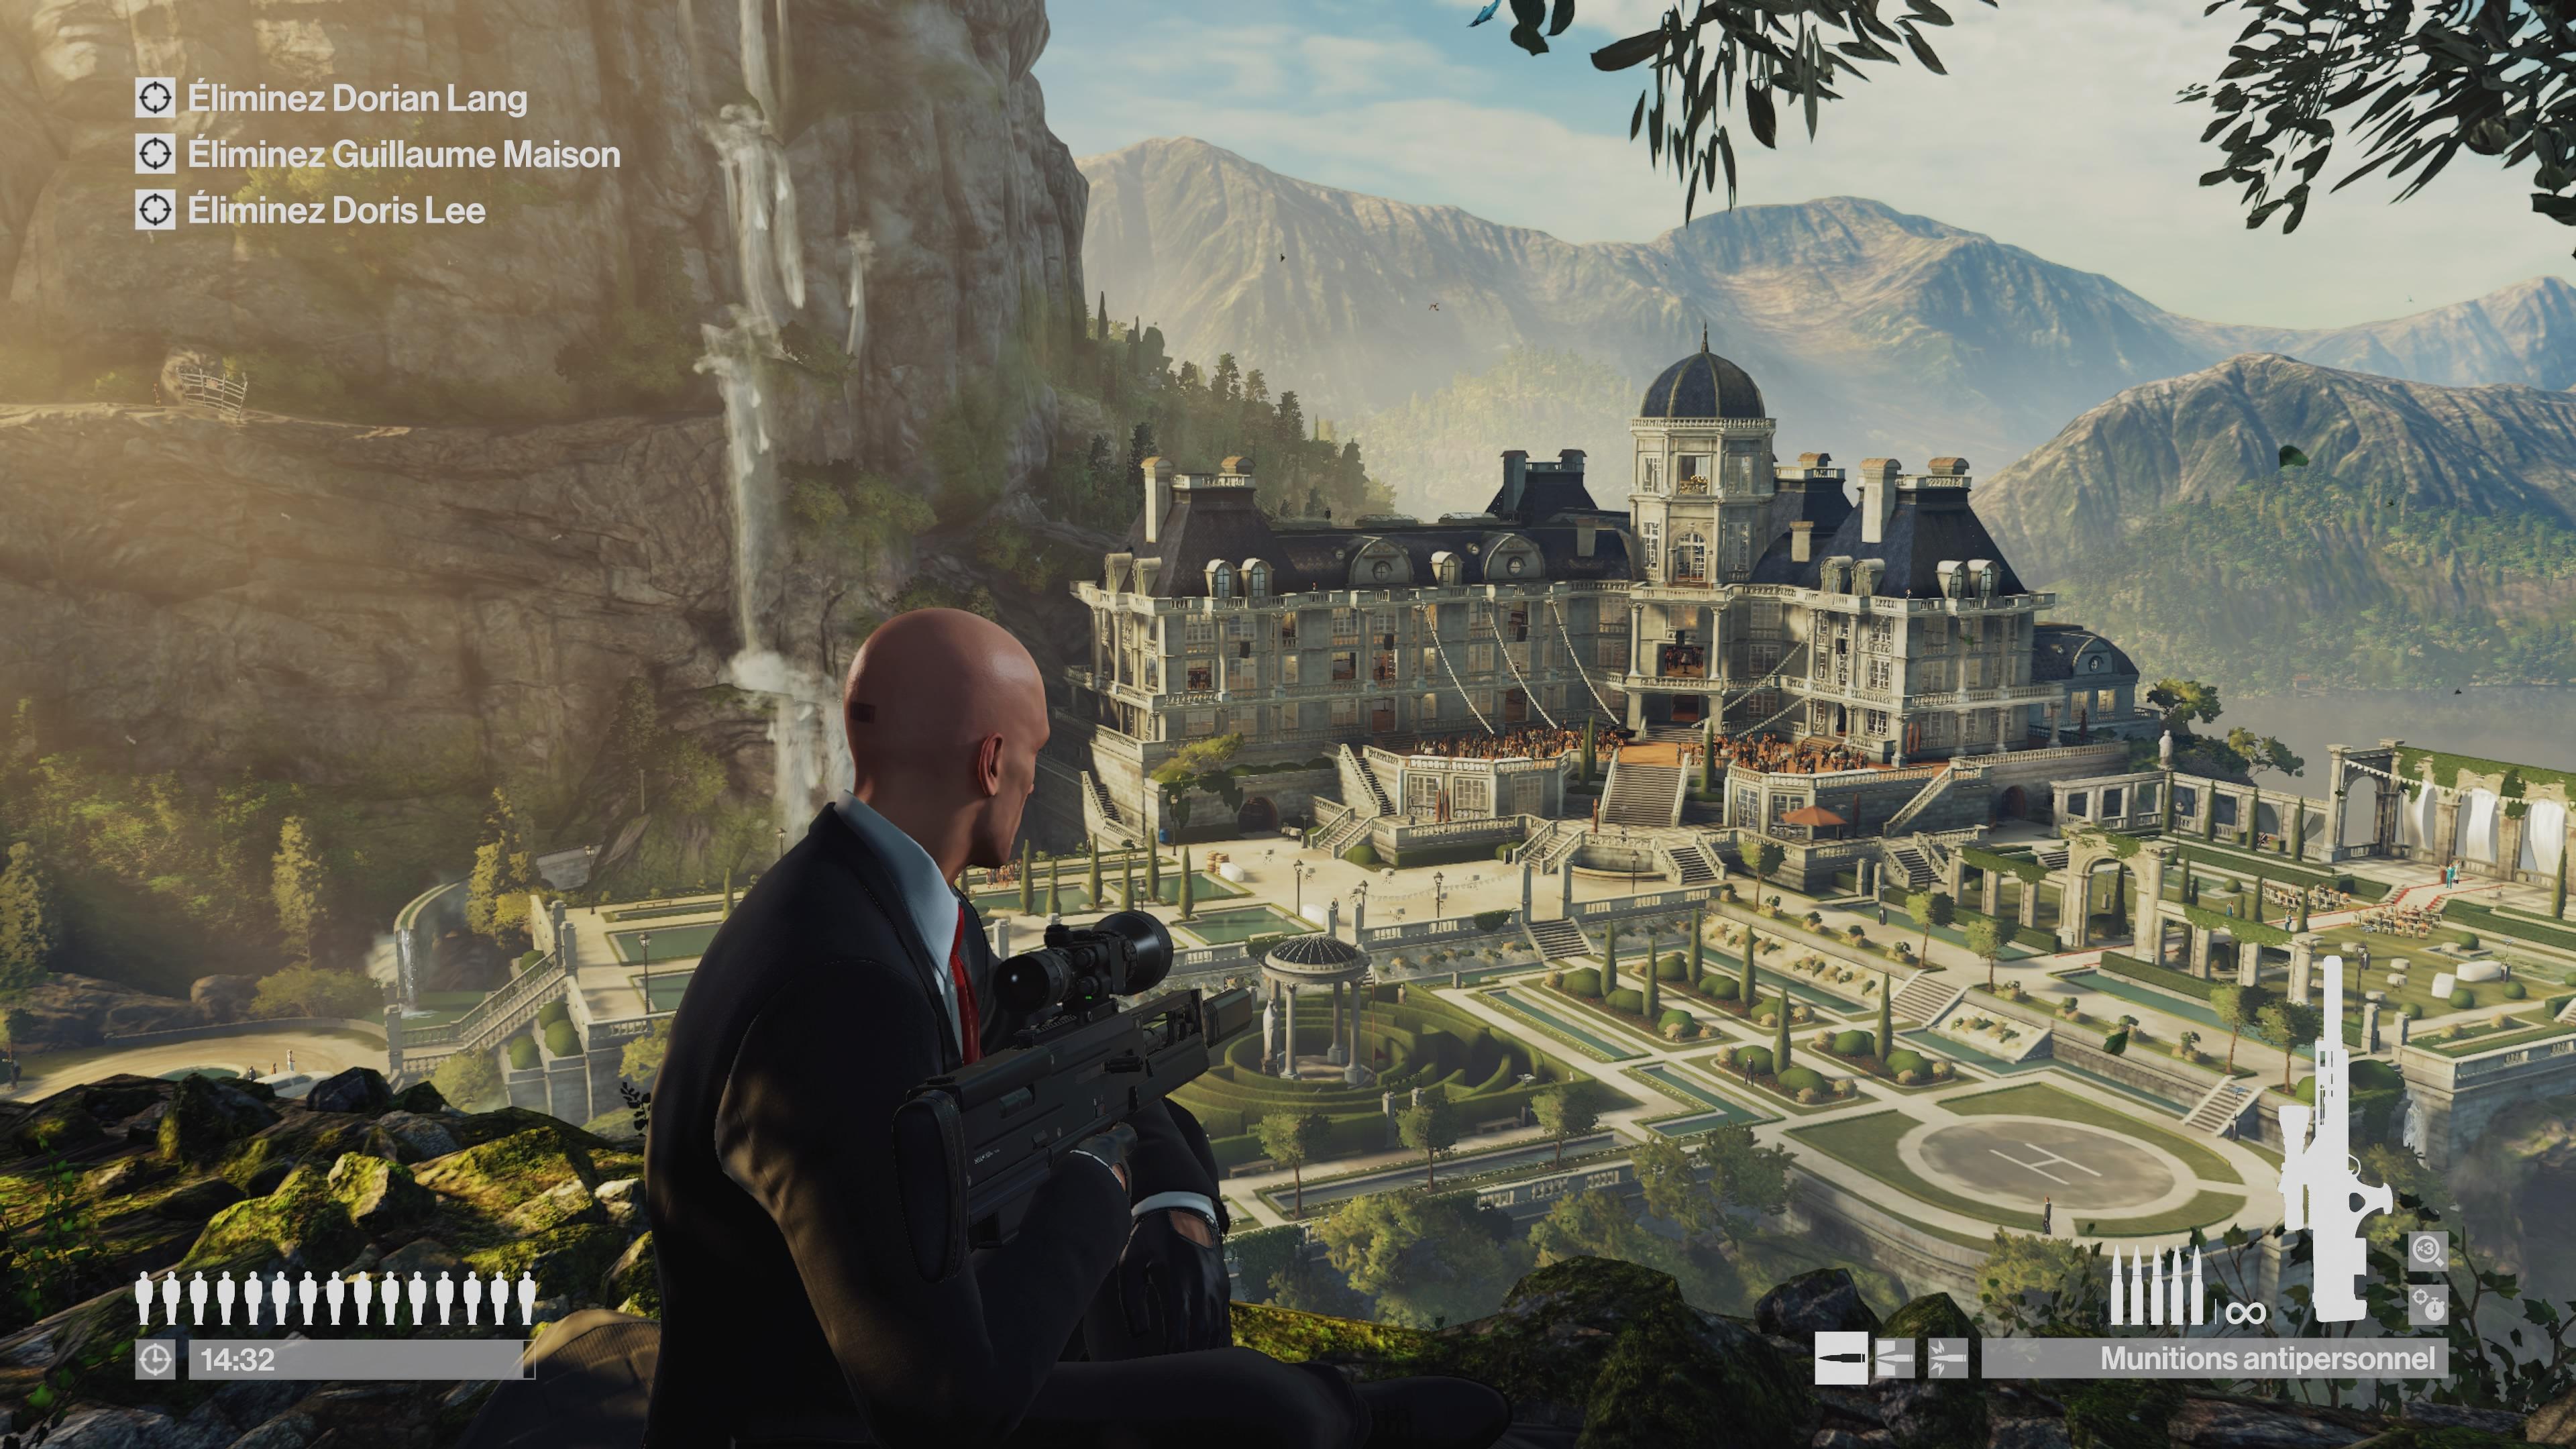 Hitman: Absolution coming to Wii U? - NintendoToday